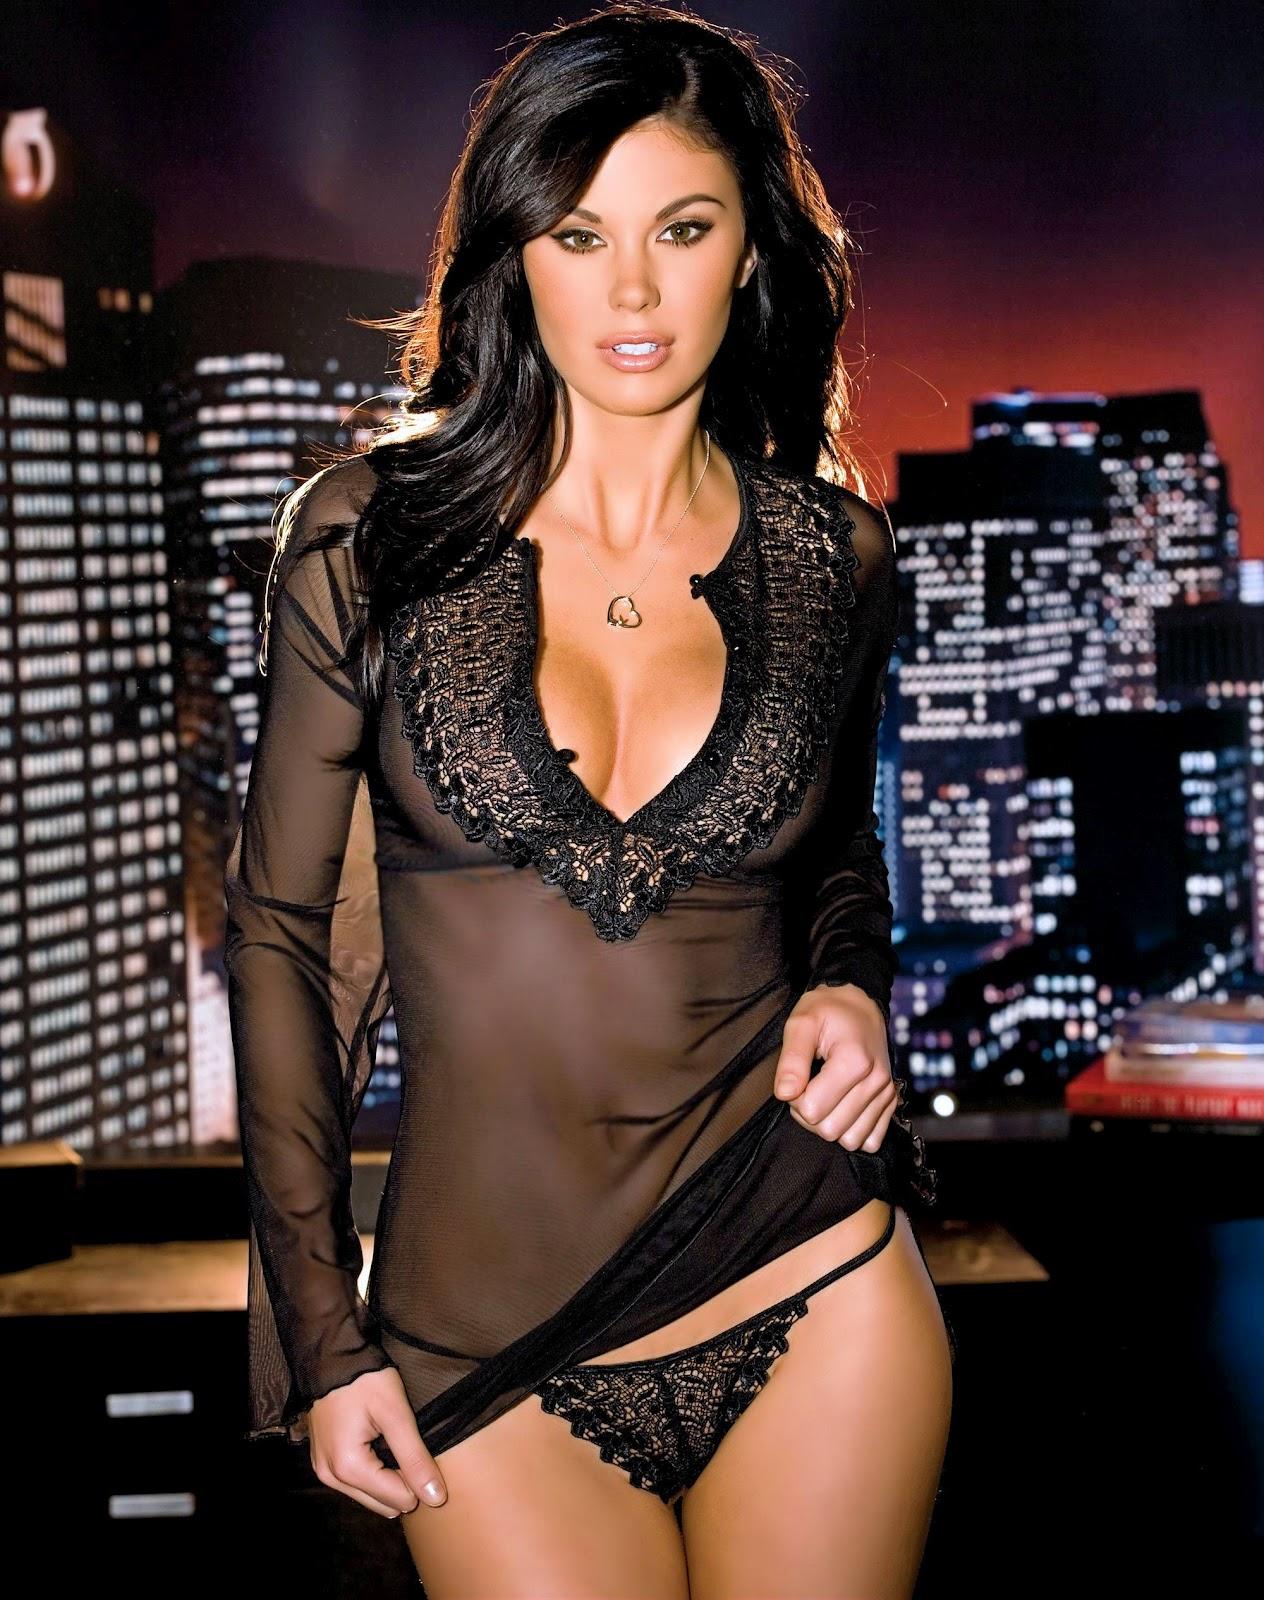 Jayde Nicole Hot